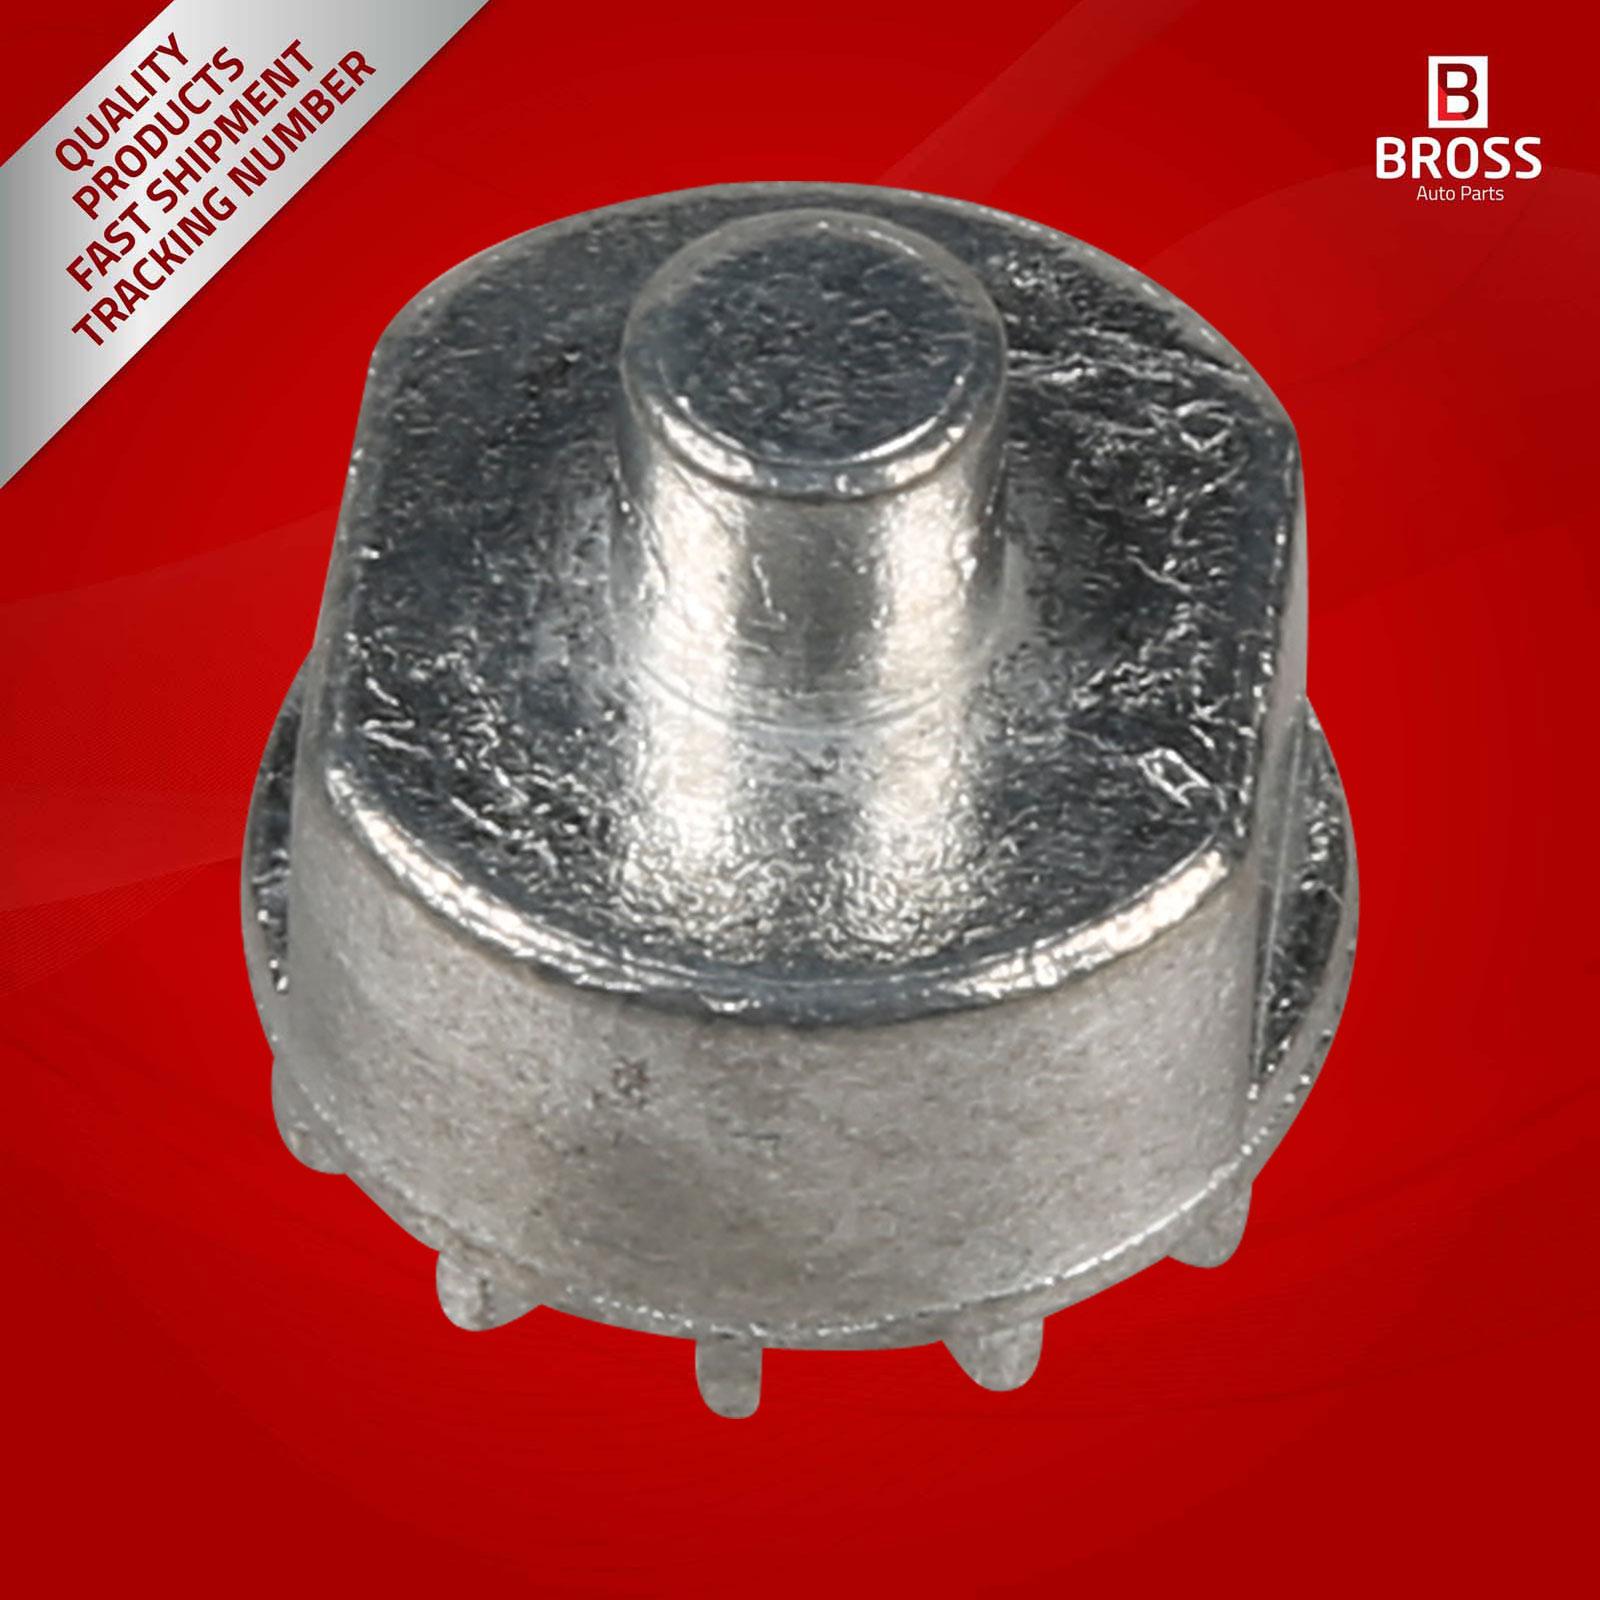 BSR44 Sunroof Motor Repair Gear Inner Gear For C3 2002-On